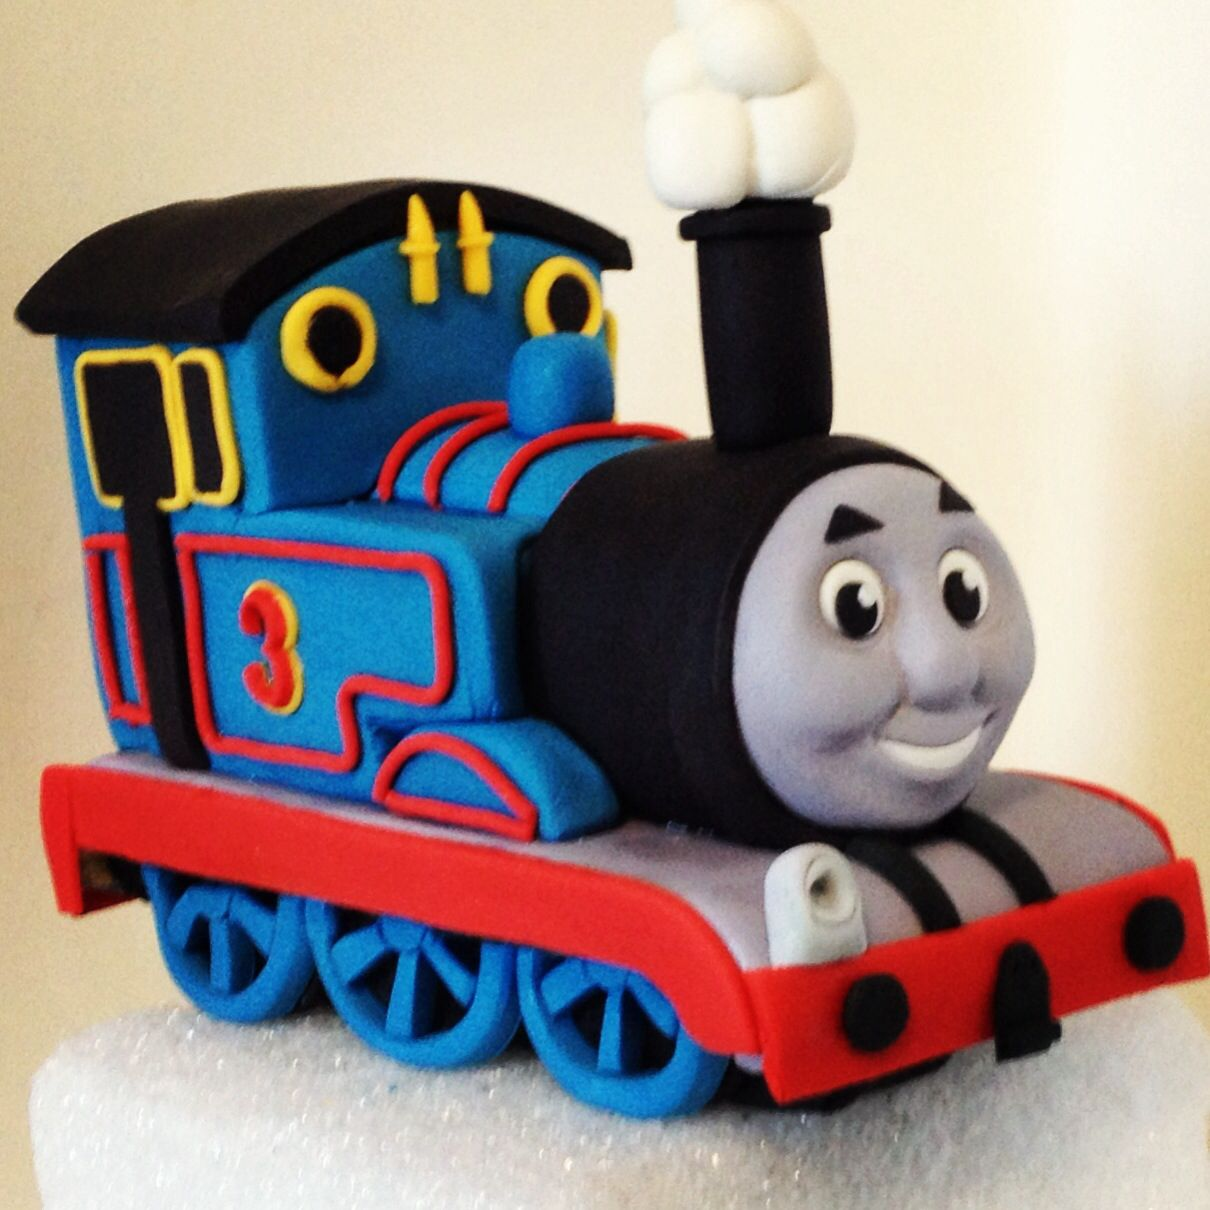 Thomas The Tank Engine Cake Topper Tutorial